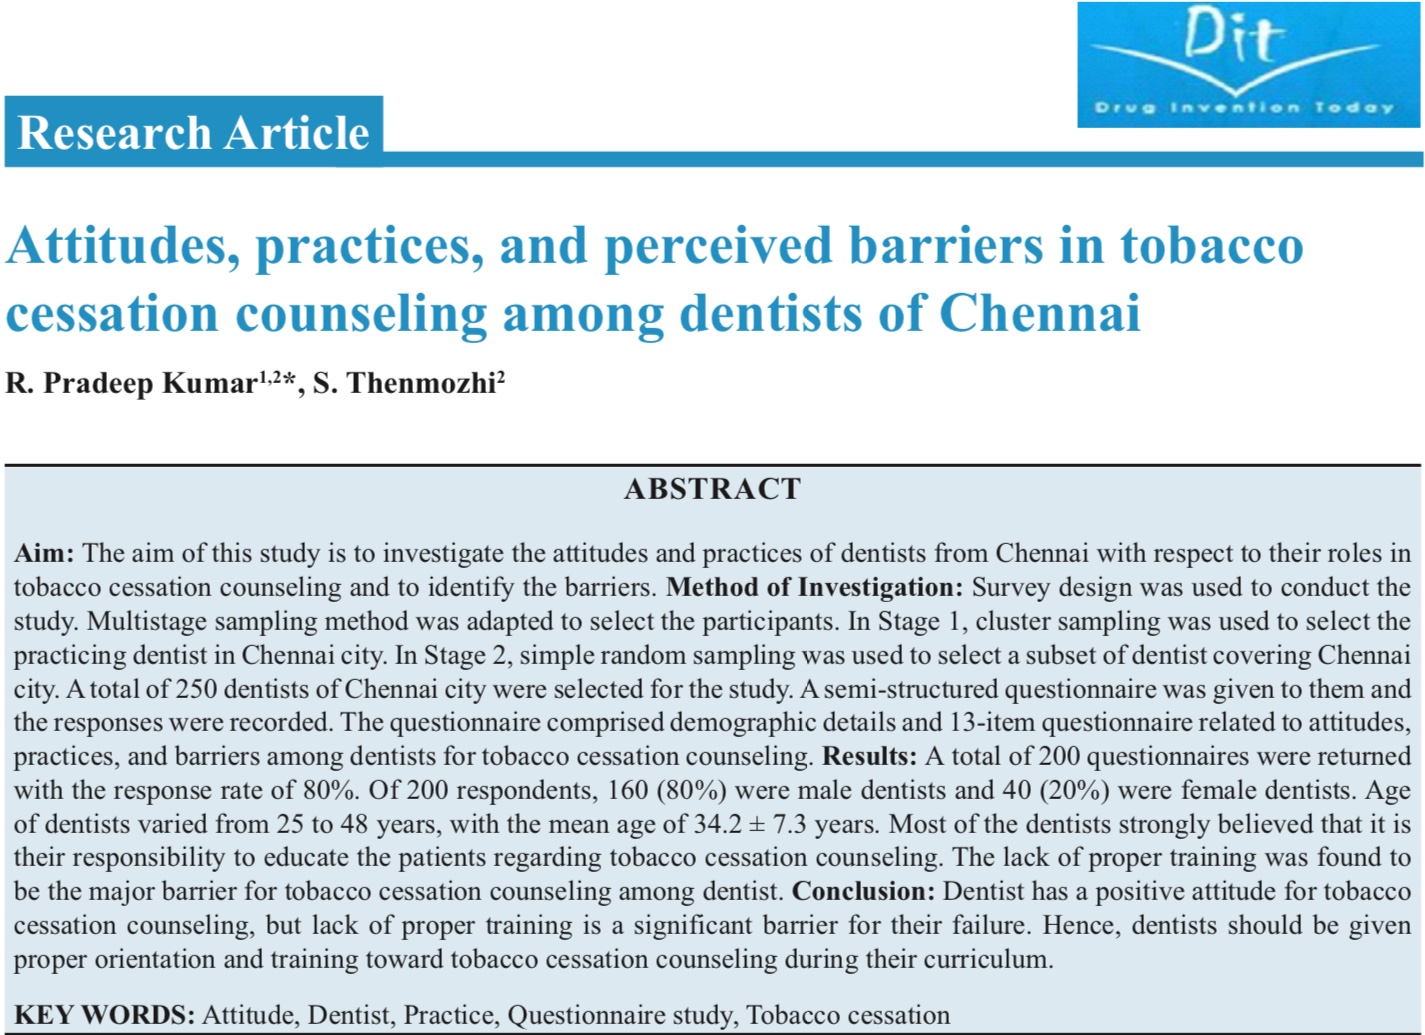 Dentist's barrier towards Tobacco cessation practices -